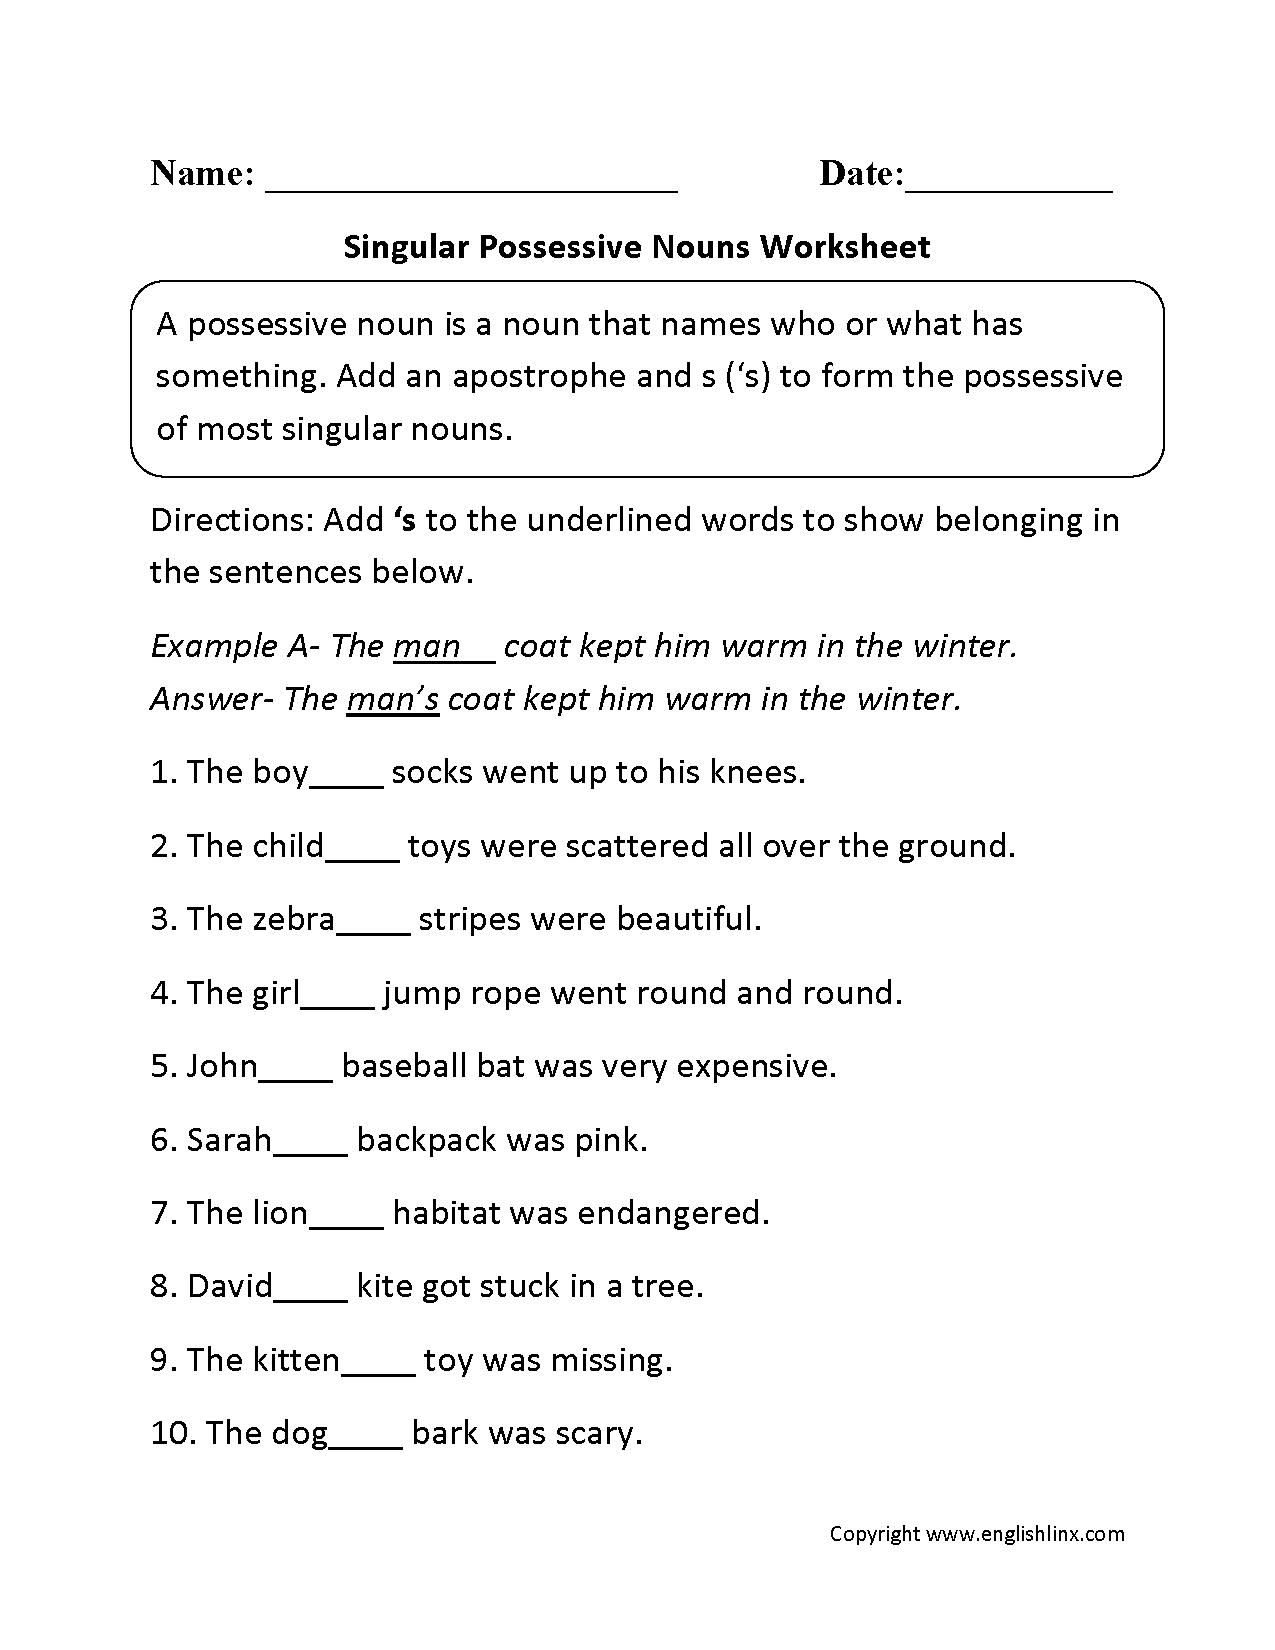 Singular And Plural Possessives Worksheets Worksheets For All